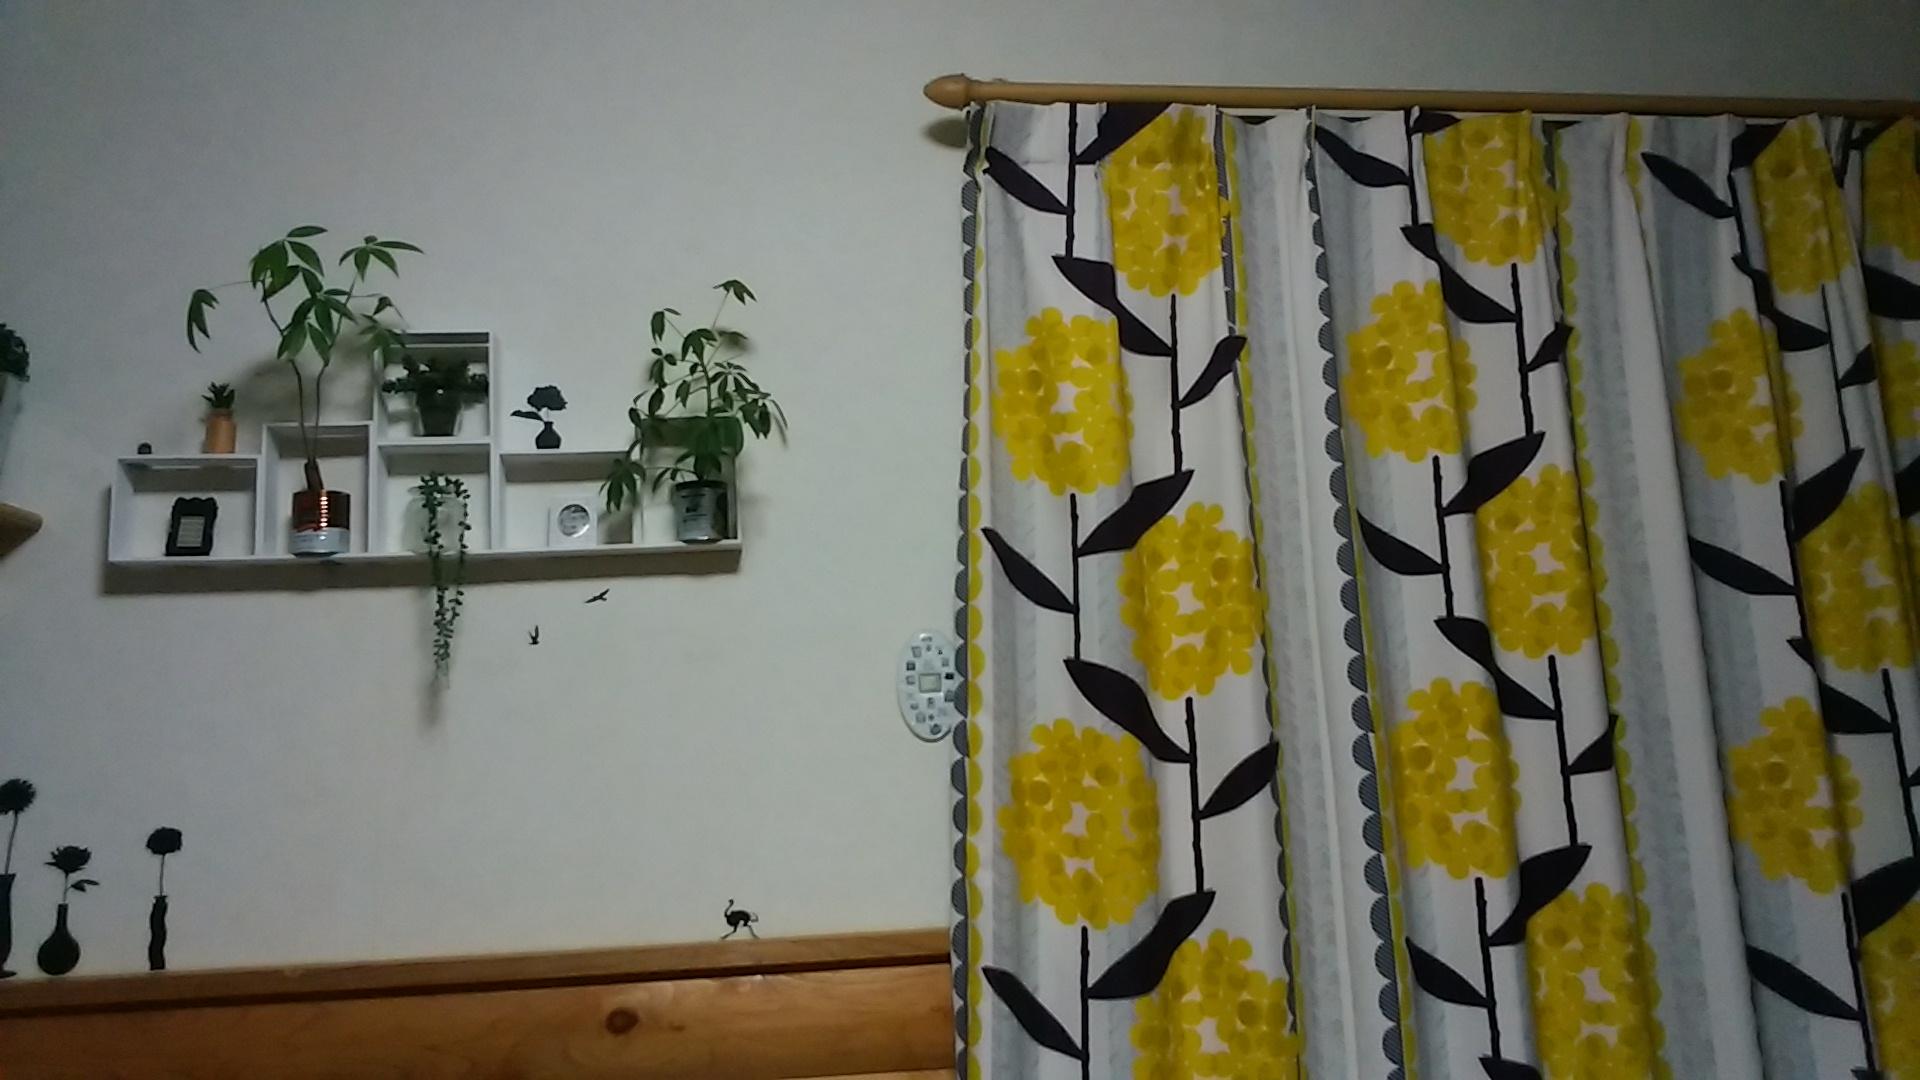 my lovely room │ びっくりカーテン商品レビュー - 宮城県のお客様より